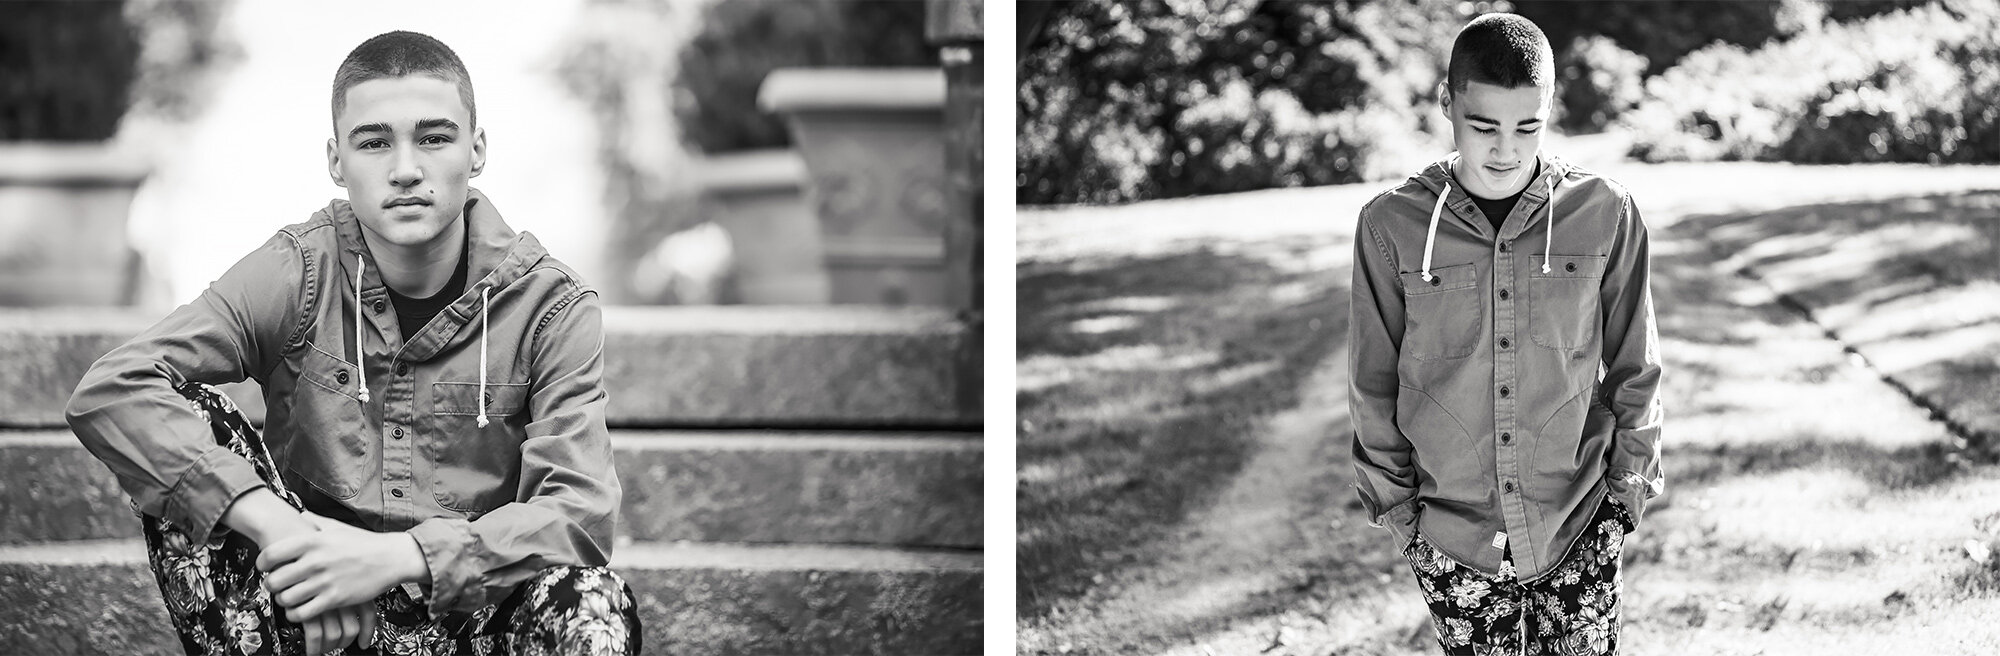 maudslay-park-senior-picture-stephen-grant-photography-029.jpg